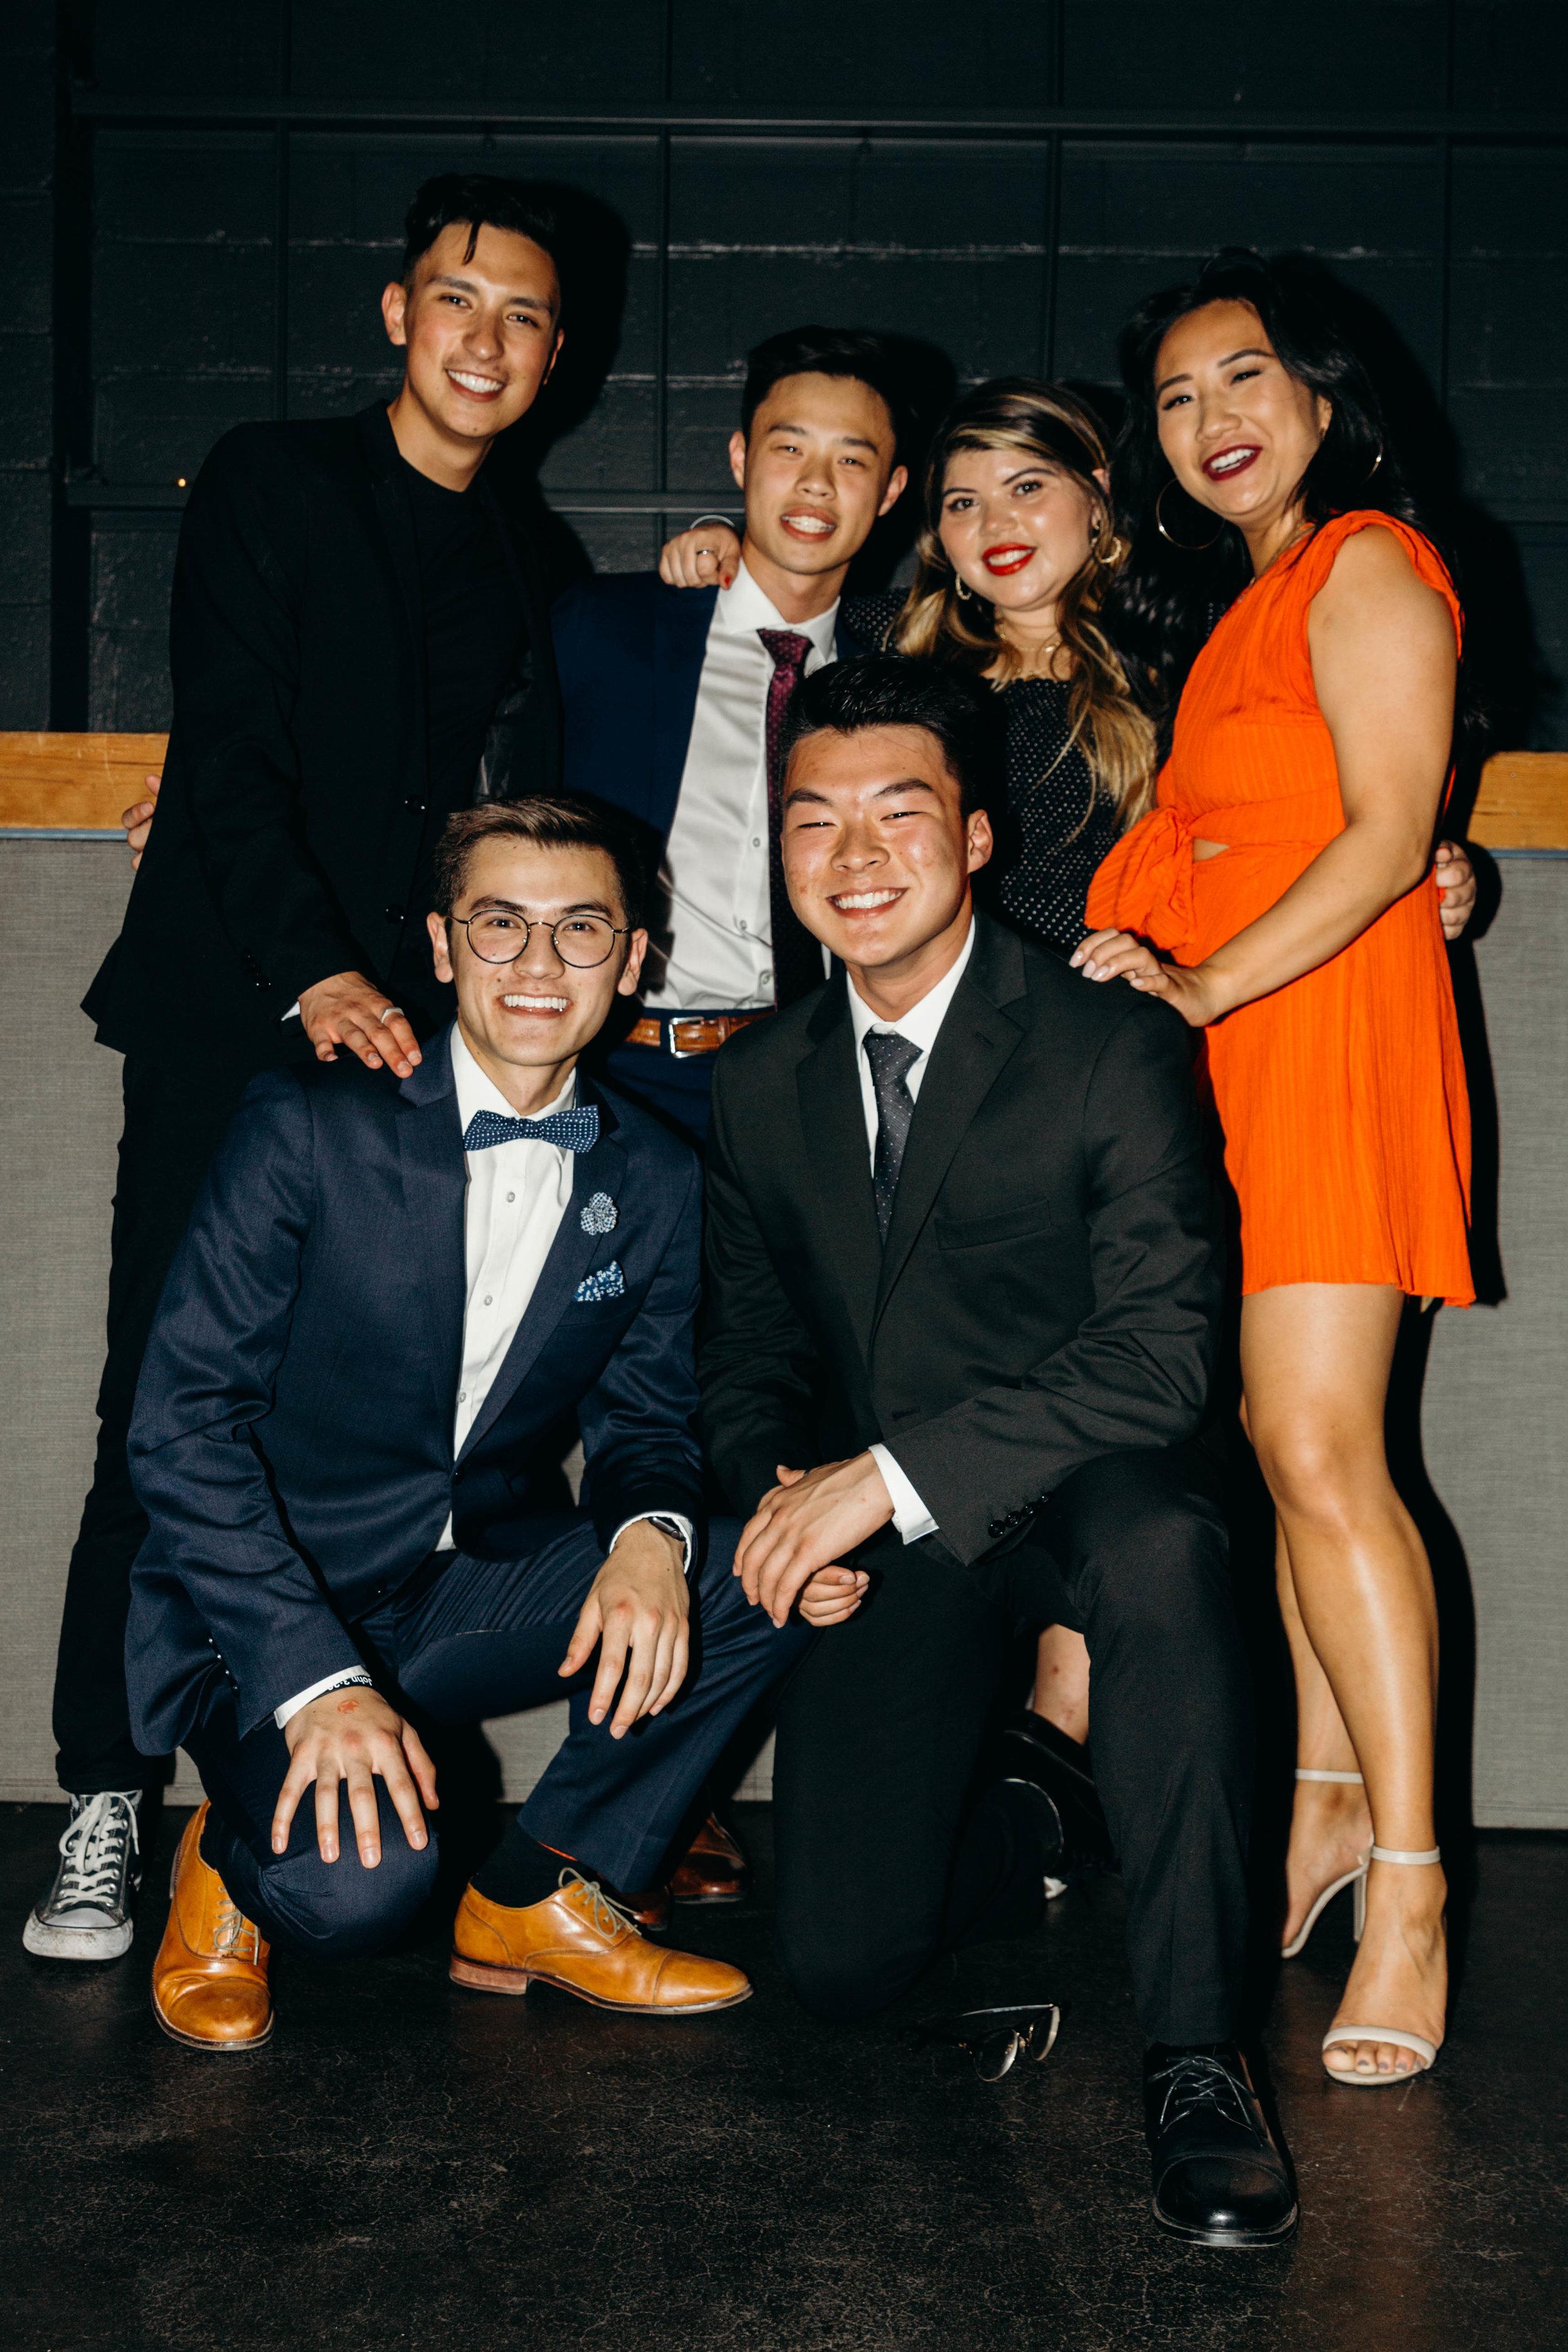 DSP's 7th Annual Banquet